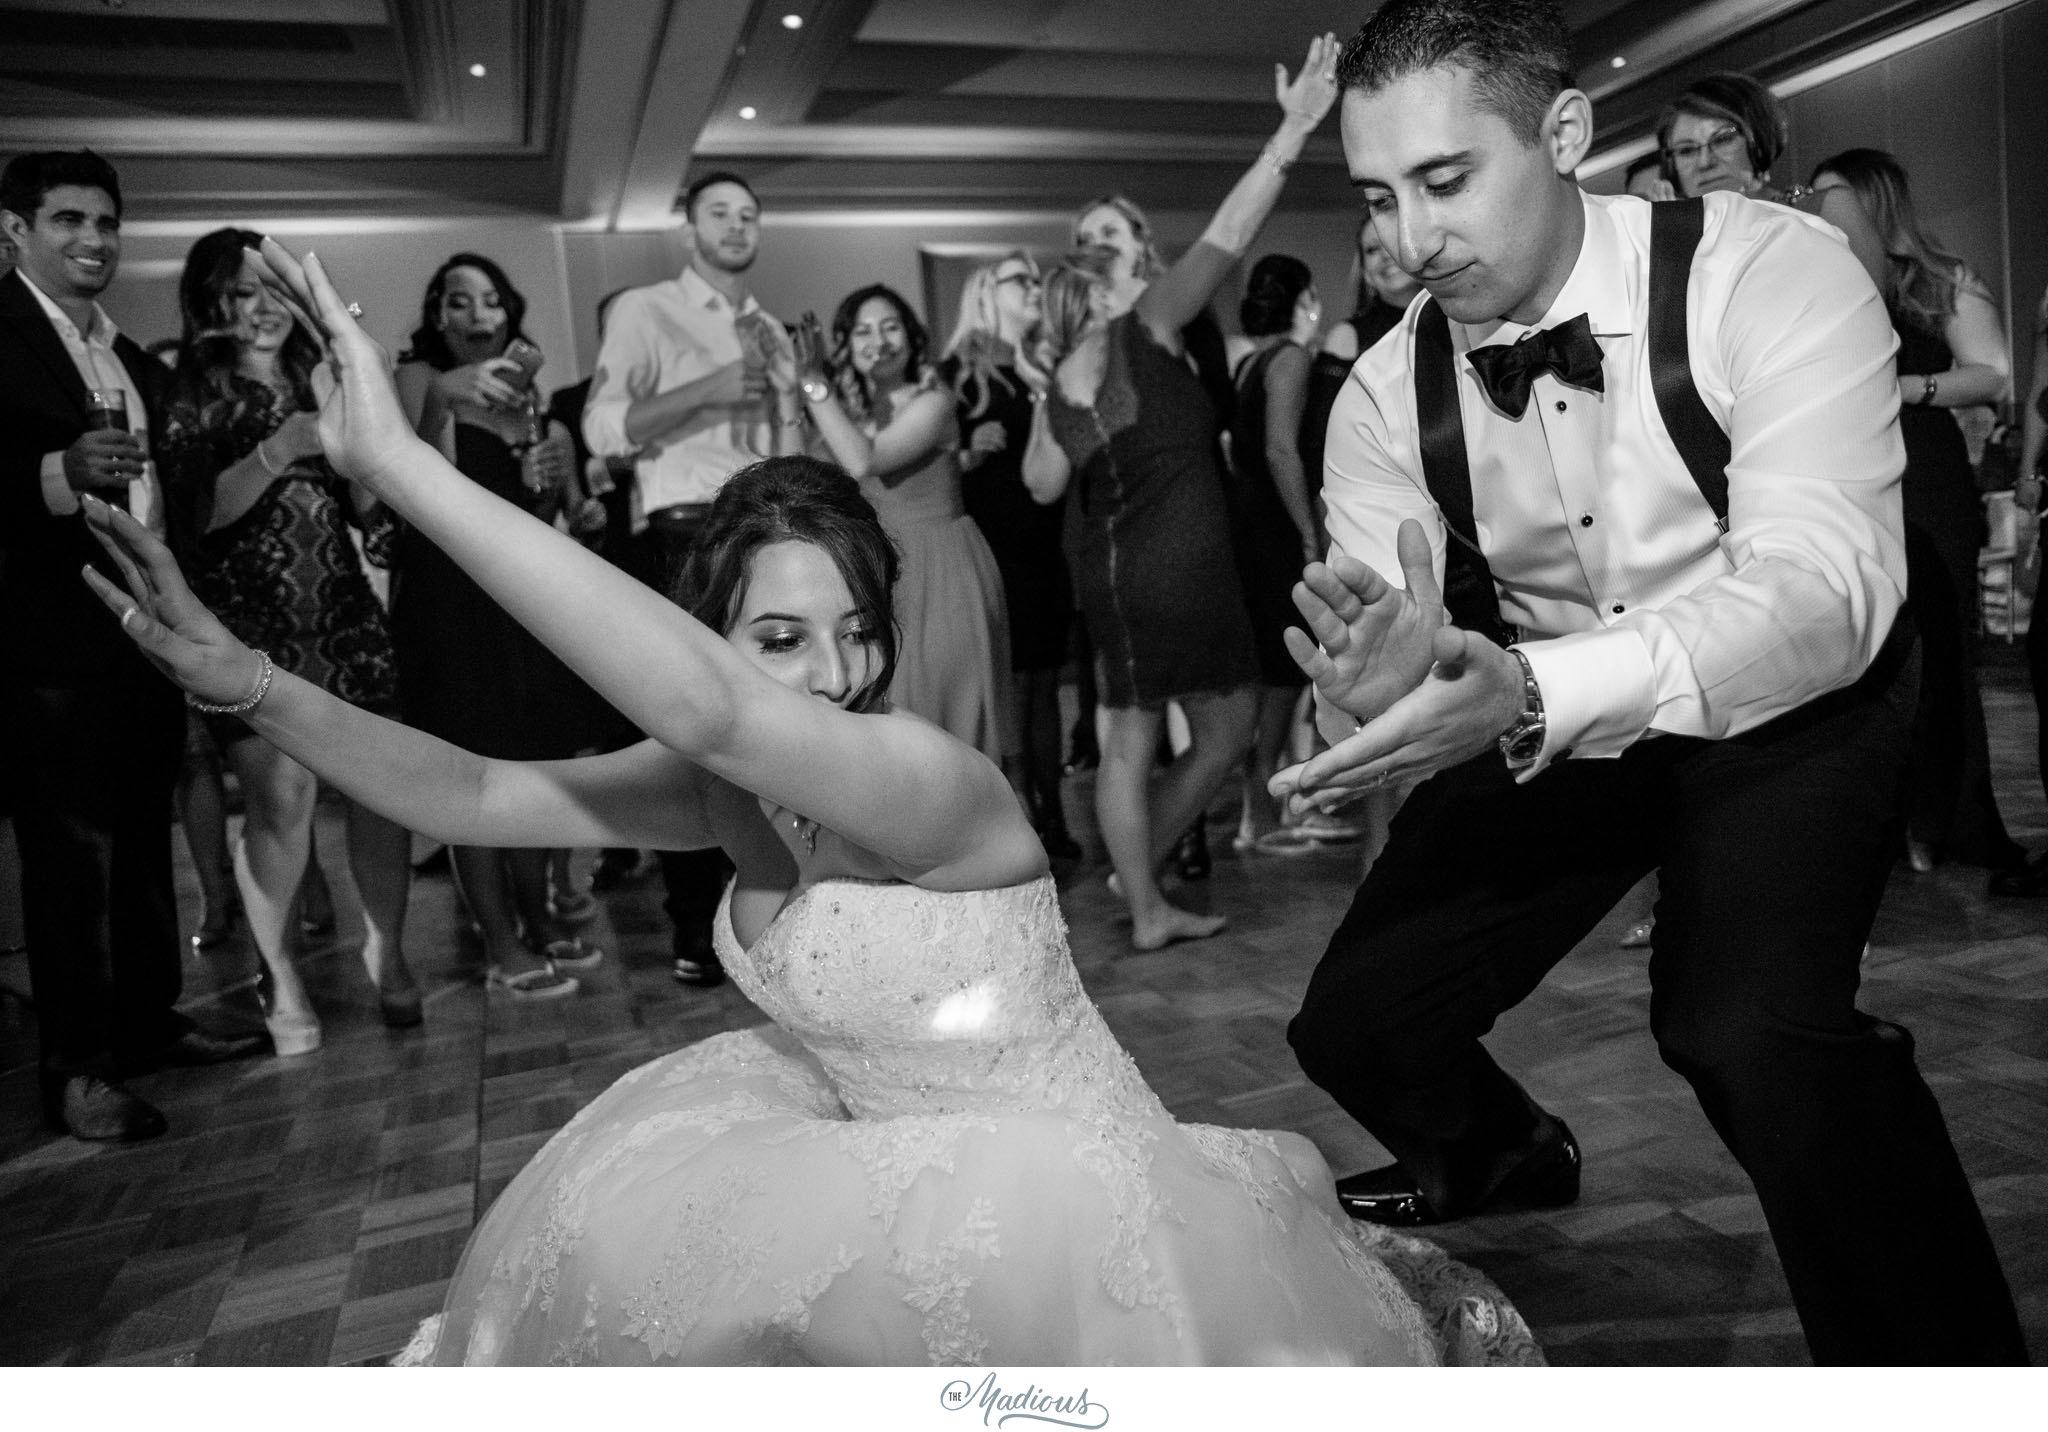 Lansdowne resort wedding shahira evan www.madious.com_977.jpg